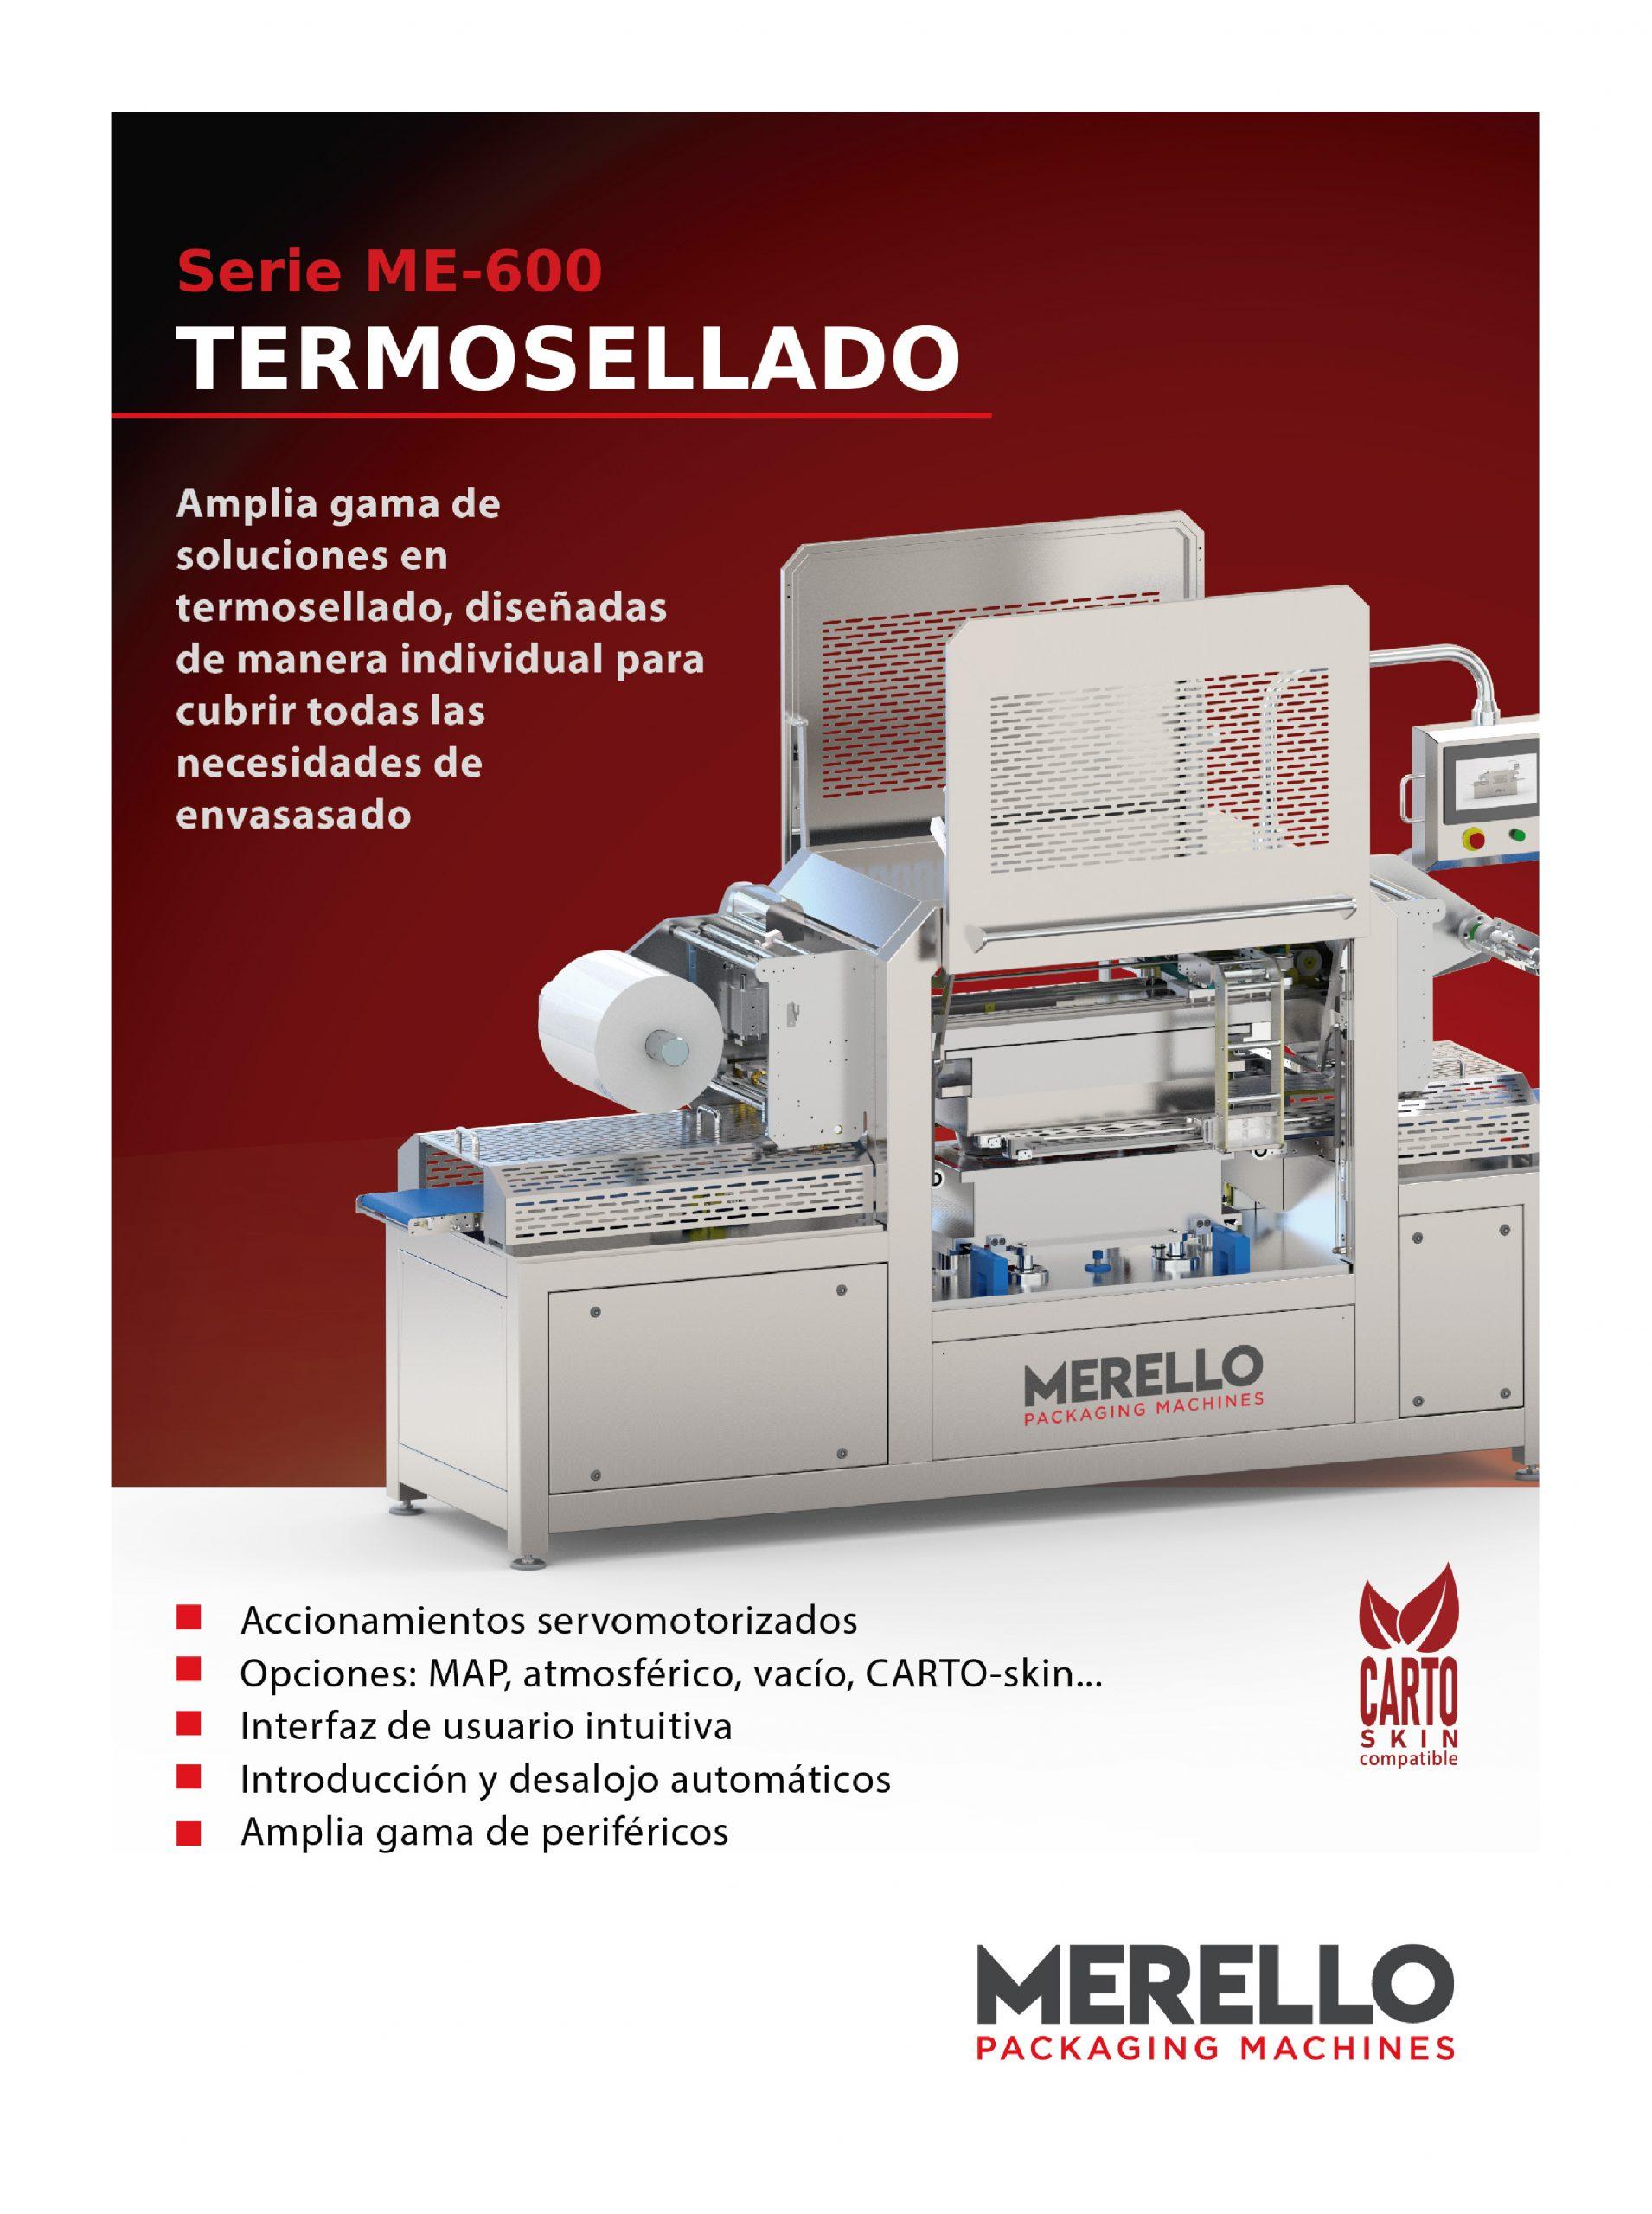 catalogo-fabricantes-maquinaria-termosellado-industrial-portada